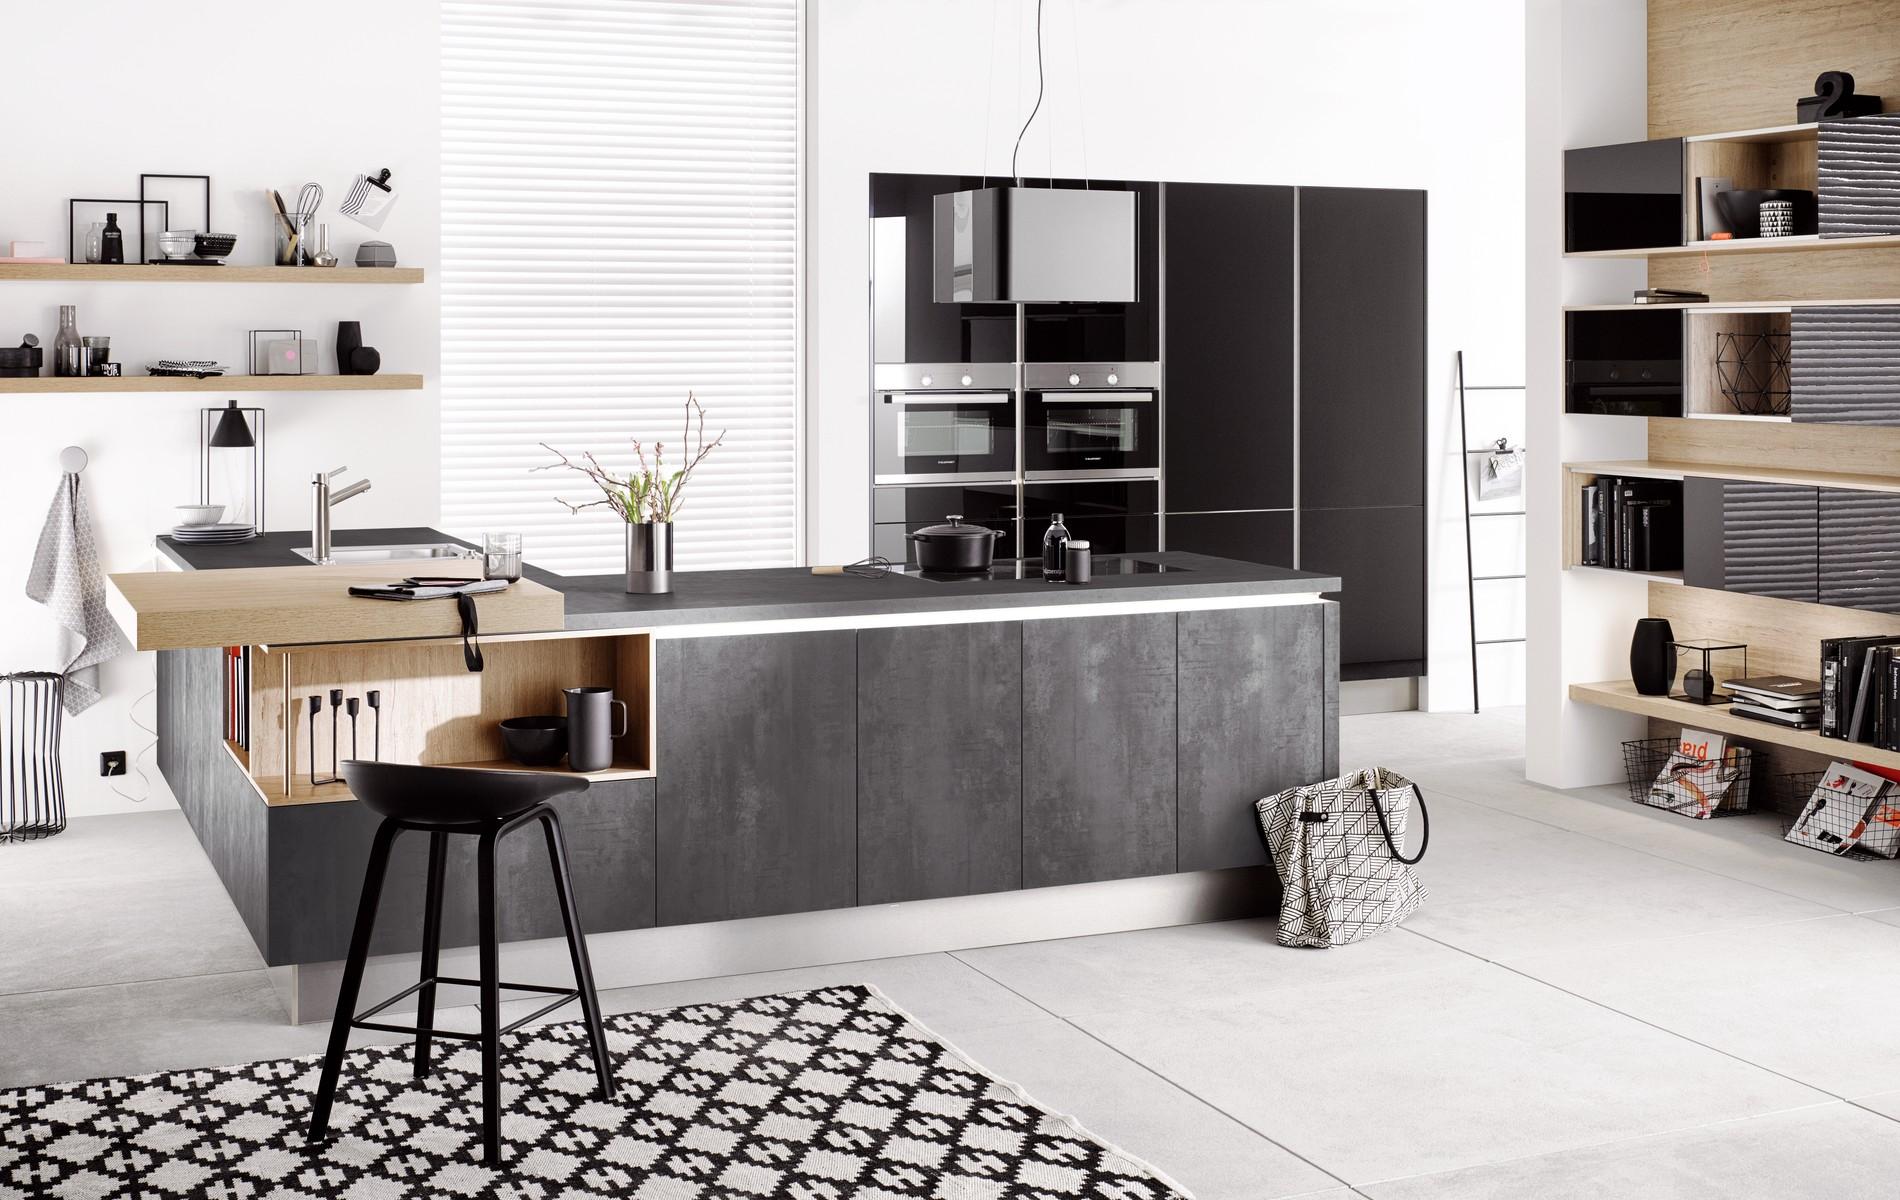 Häcker Küchen präsentiert neue Fronten in Betonoptik – Küchenhaus ...